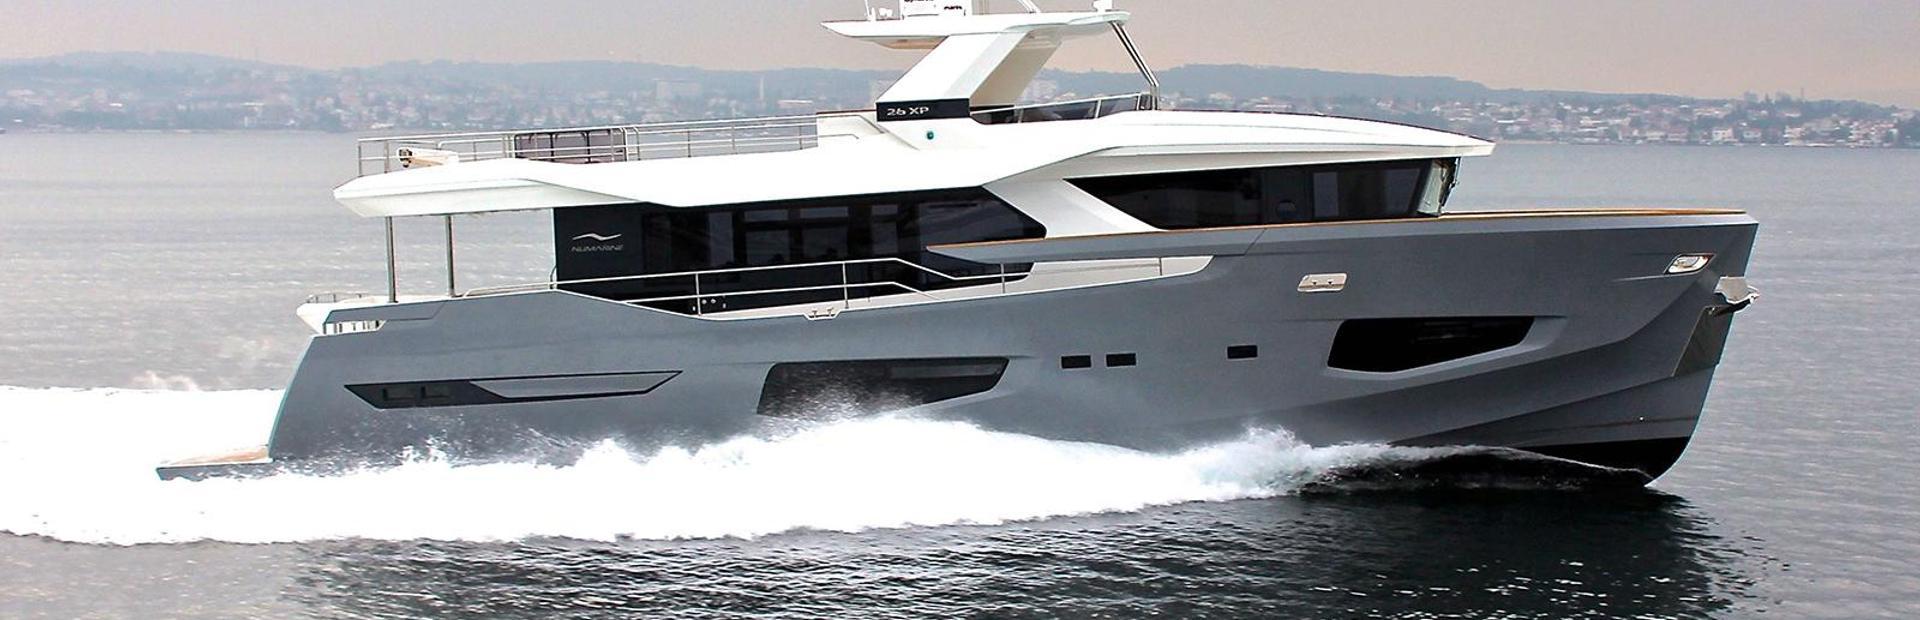 26 XP Yacht Charter